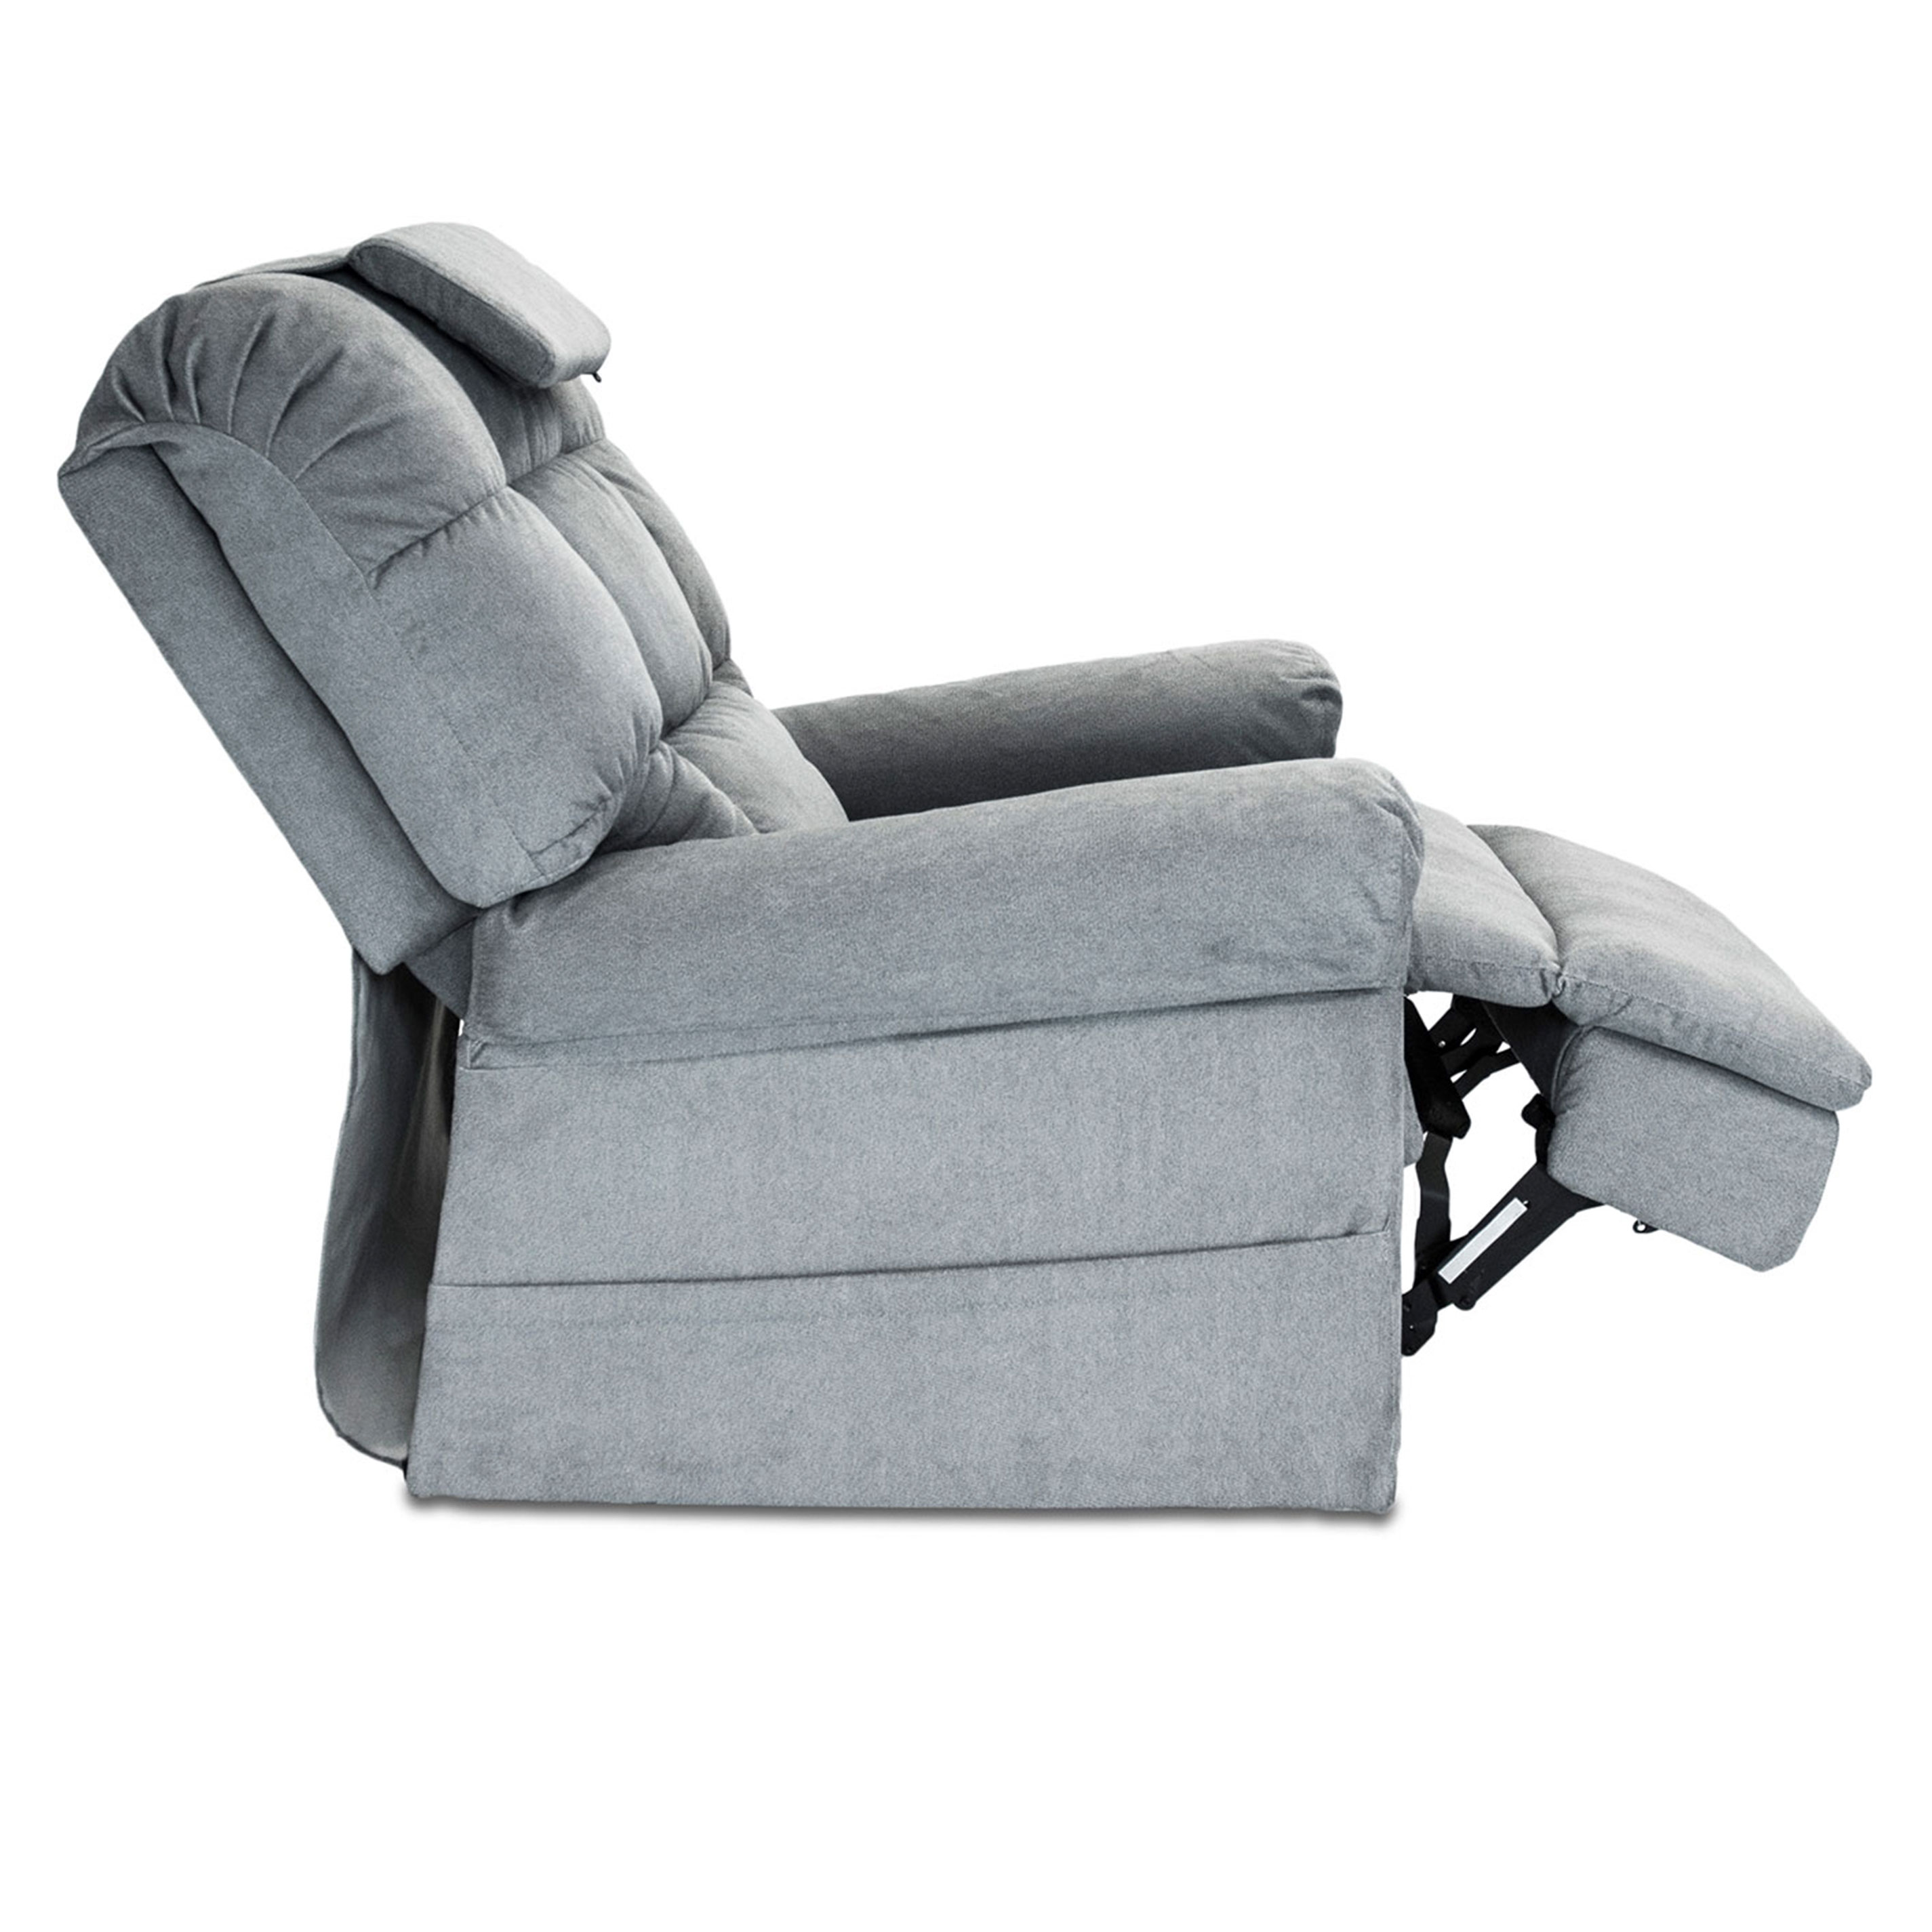 Fine Wiselift 450 Sleeper Lift Chair Recliner Granite Enduralux Fabric Onthecornerstone Fun Painted Chair Ideas Images Onthecornerstoneorg